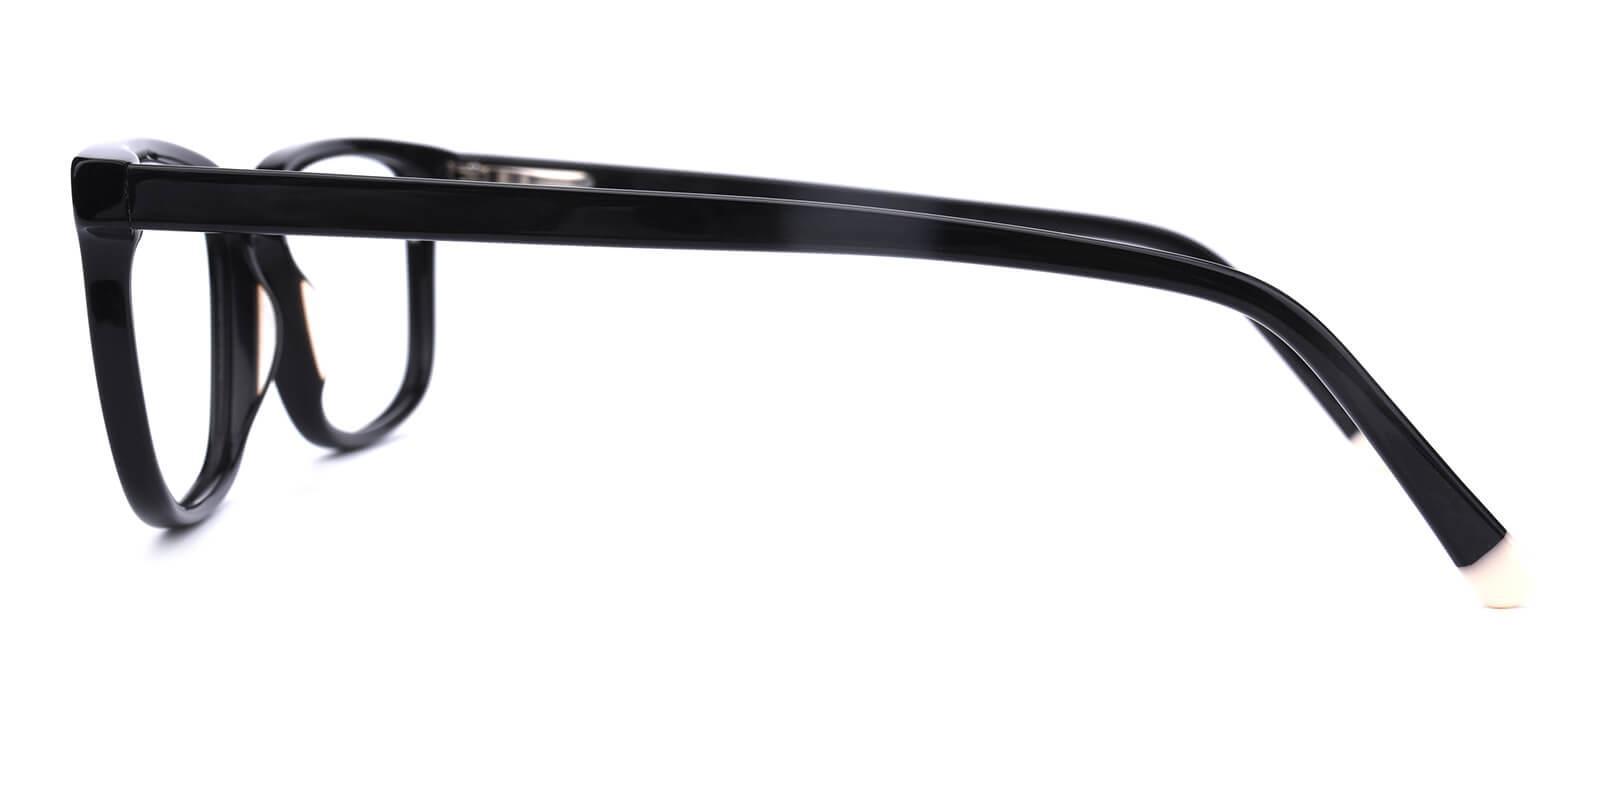 Connotation-Striped-Rectangle-Acetate-Eyeglasses-detail